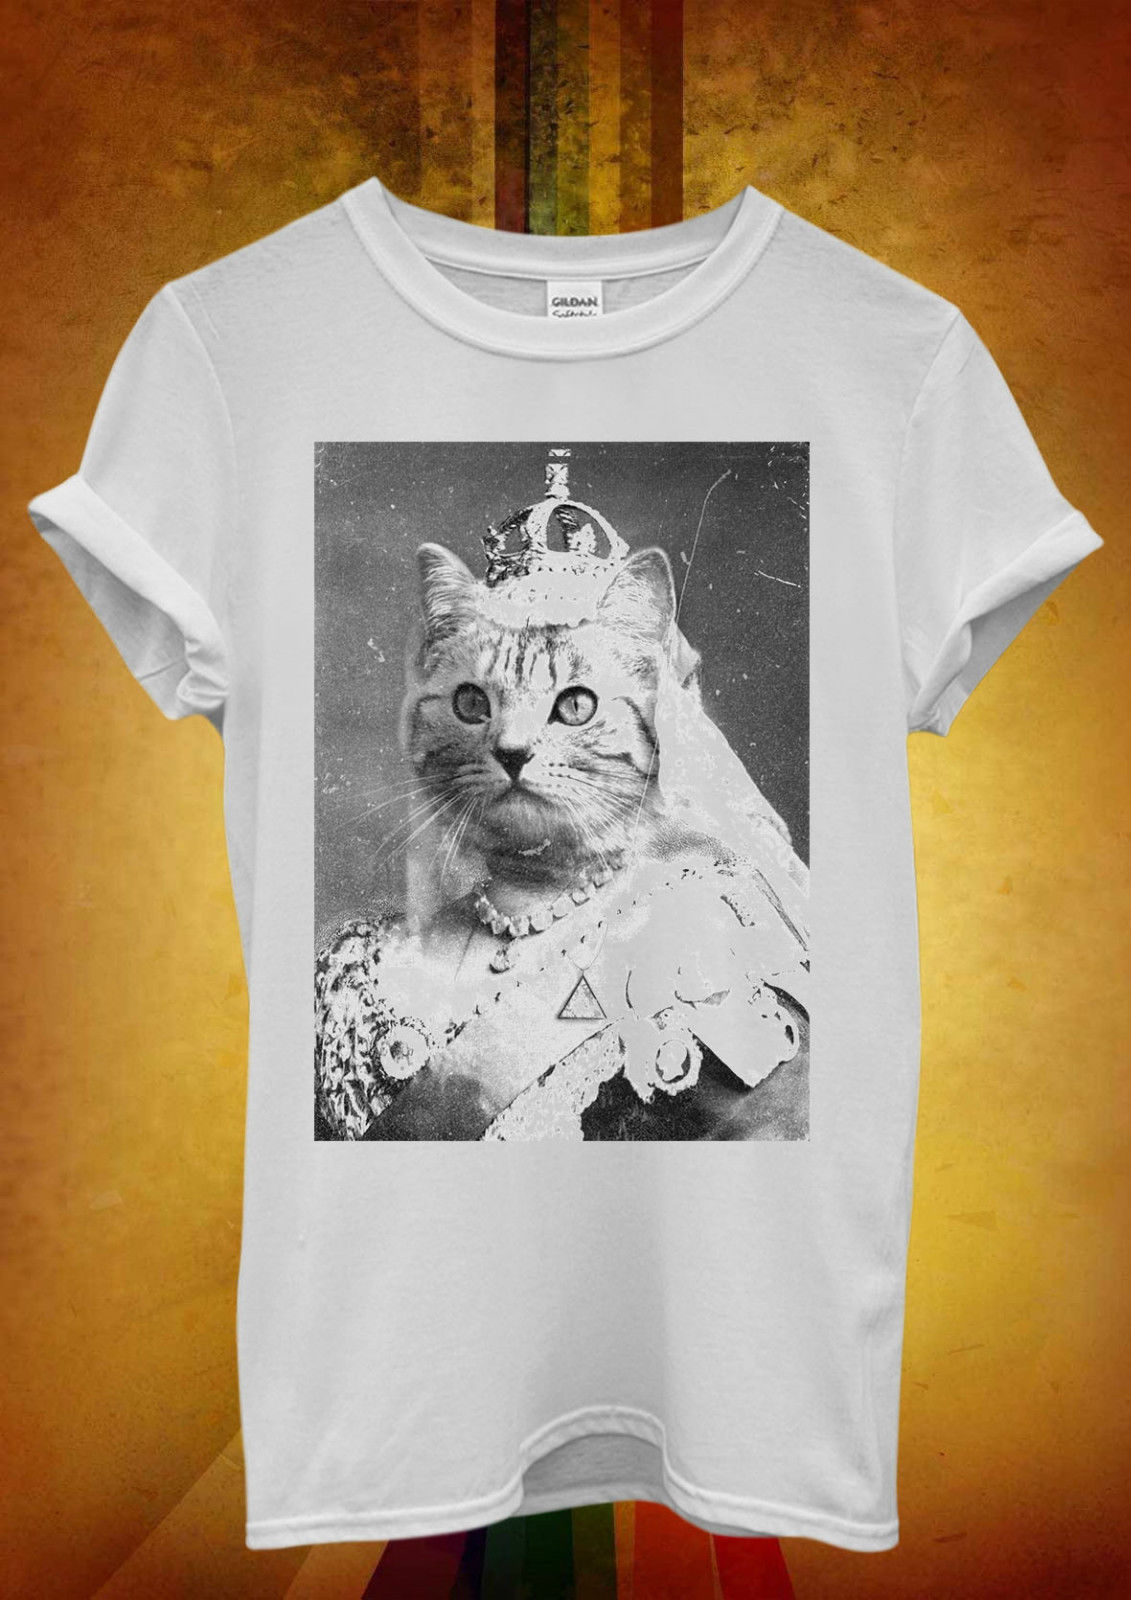 Cat Queen Kitten Meow Funny Cool Men Women Unisex T Shirt  Vest 1042 New Shirts Tops Tee